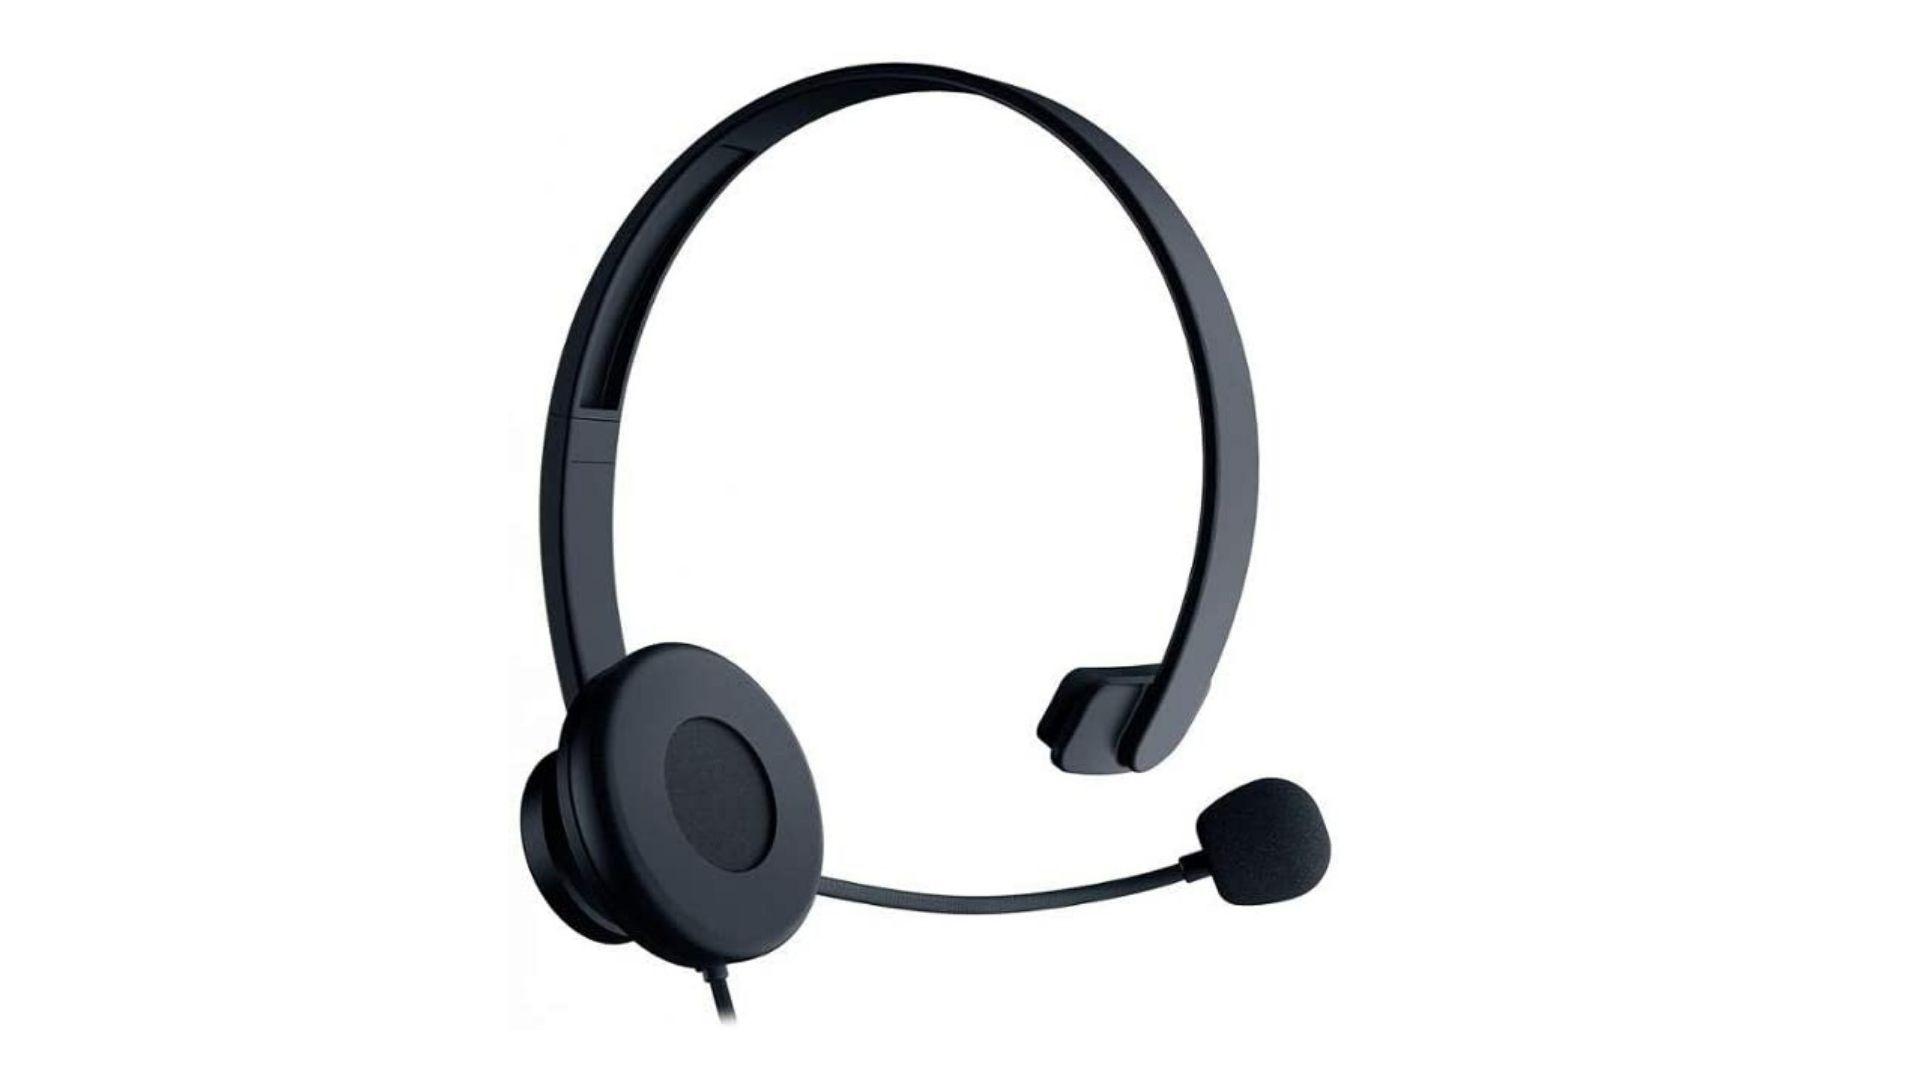 Headset Razer Tetra P2 preto no fundo branco